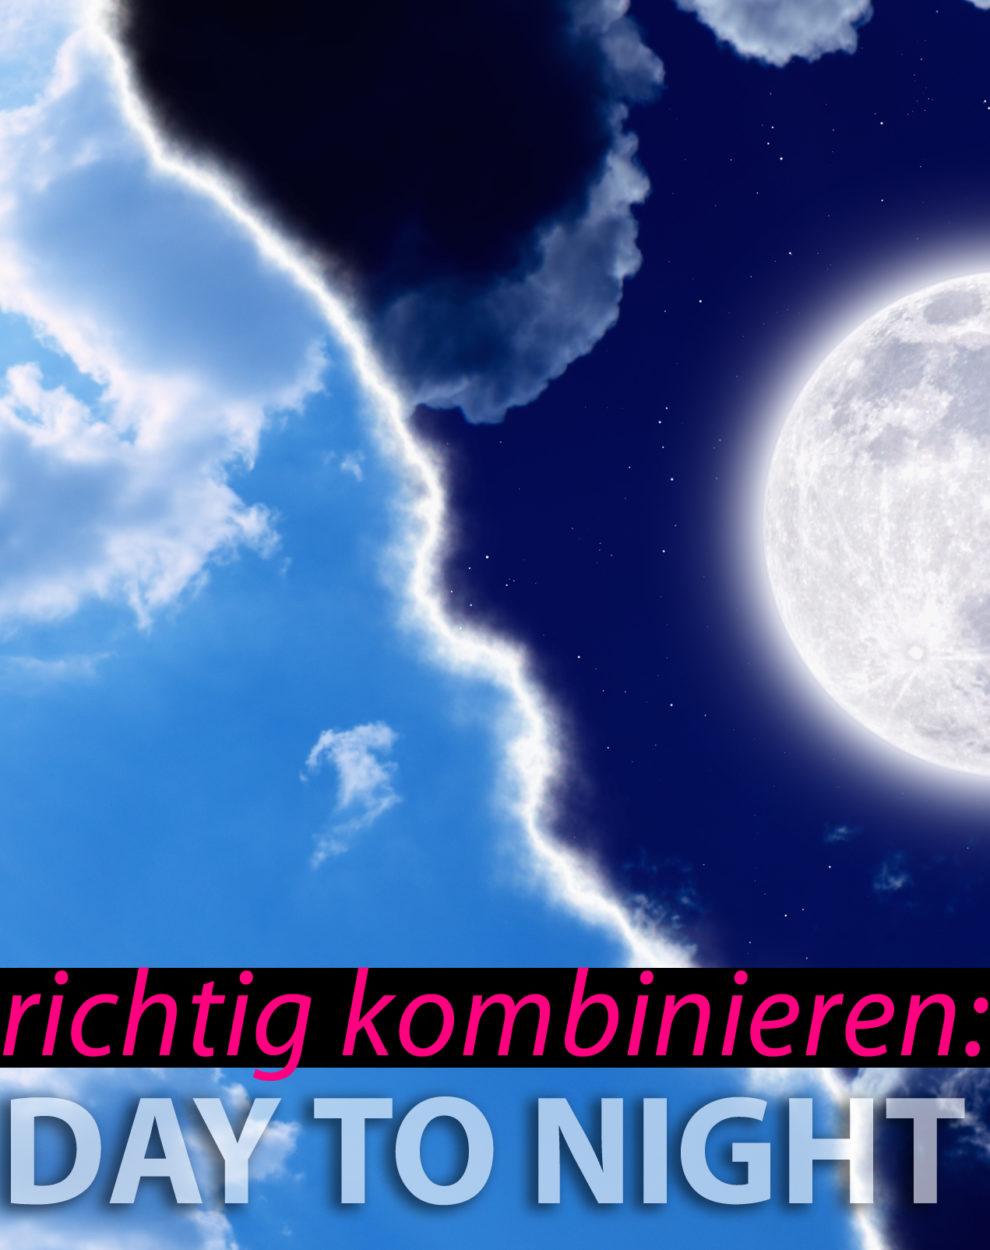 dday to night beitragsbild